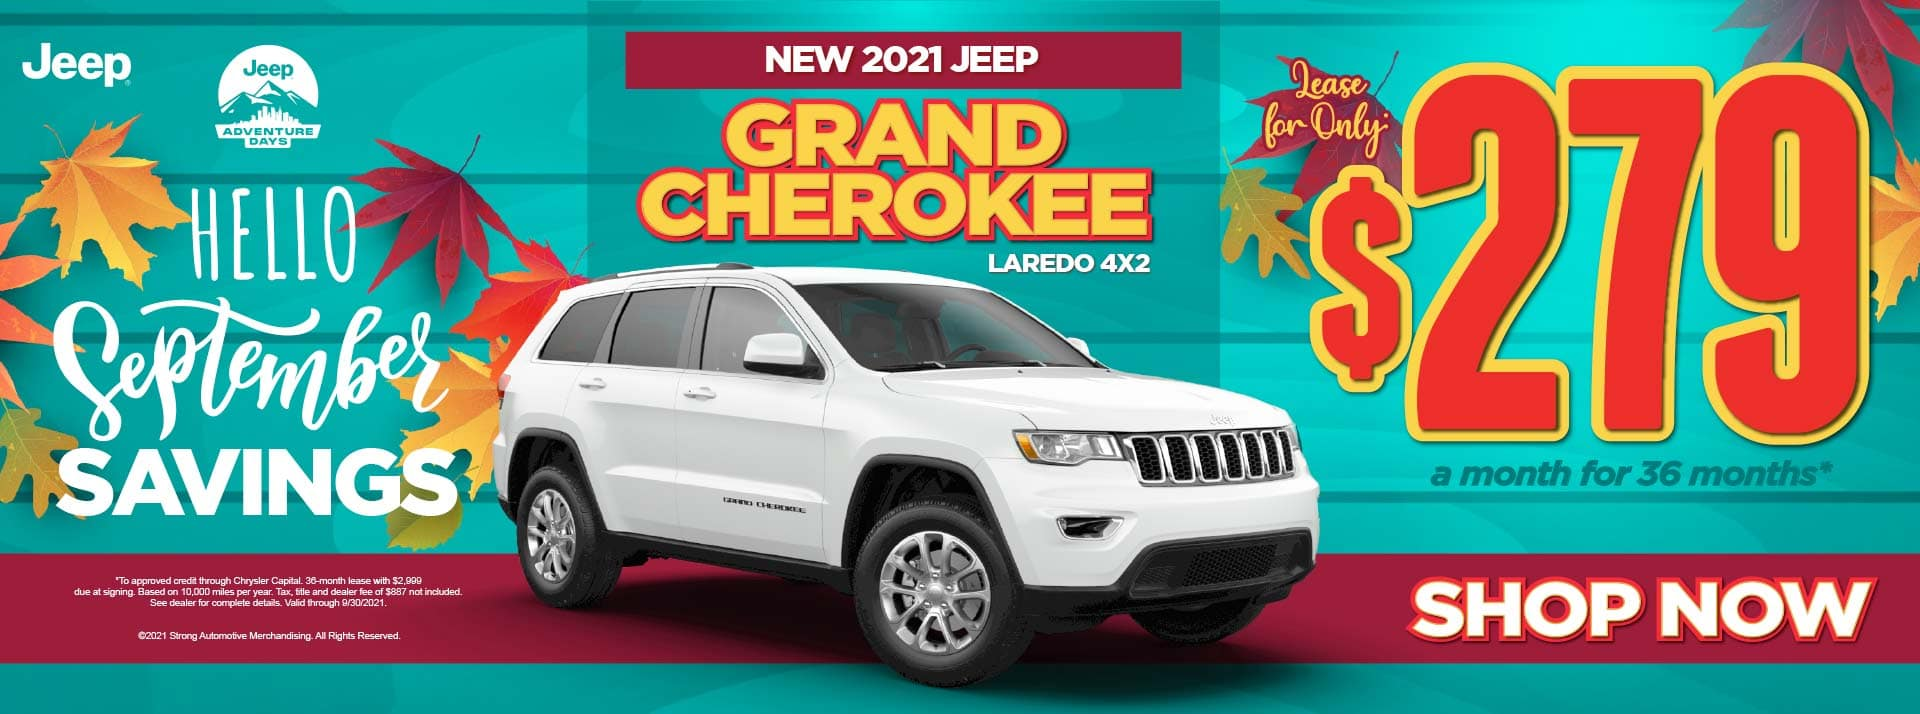 New 2021 Jeep Grand Cherokee Laredo 4x2 - $279 / mo ACT NOW